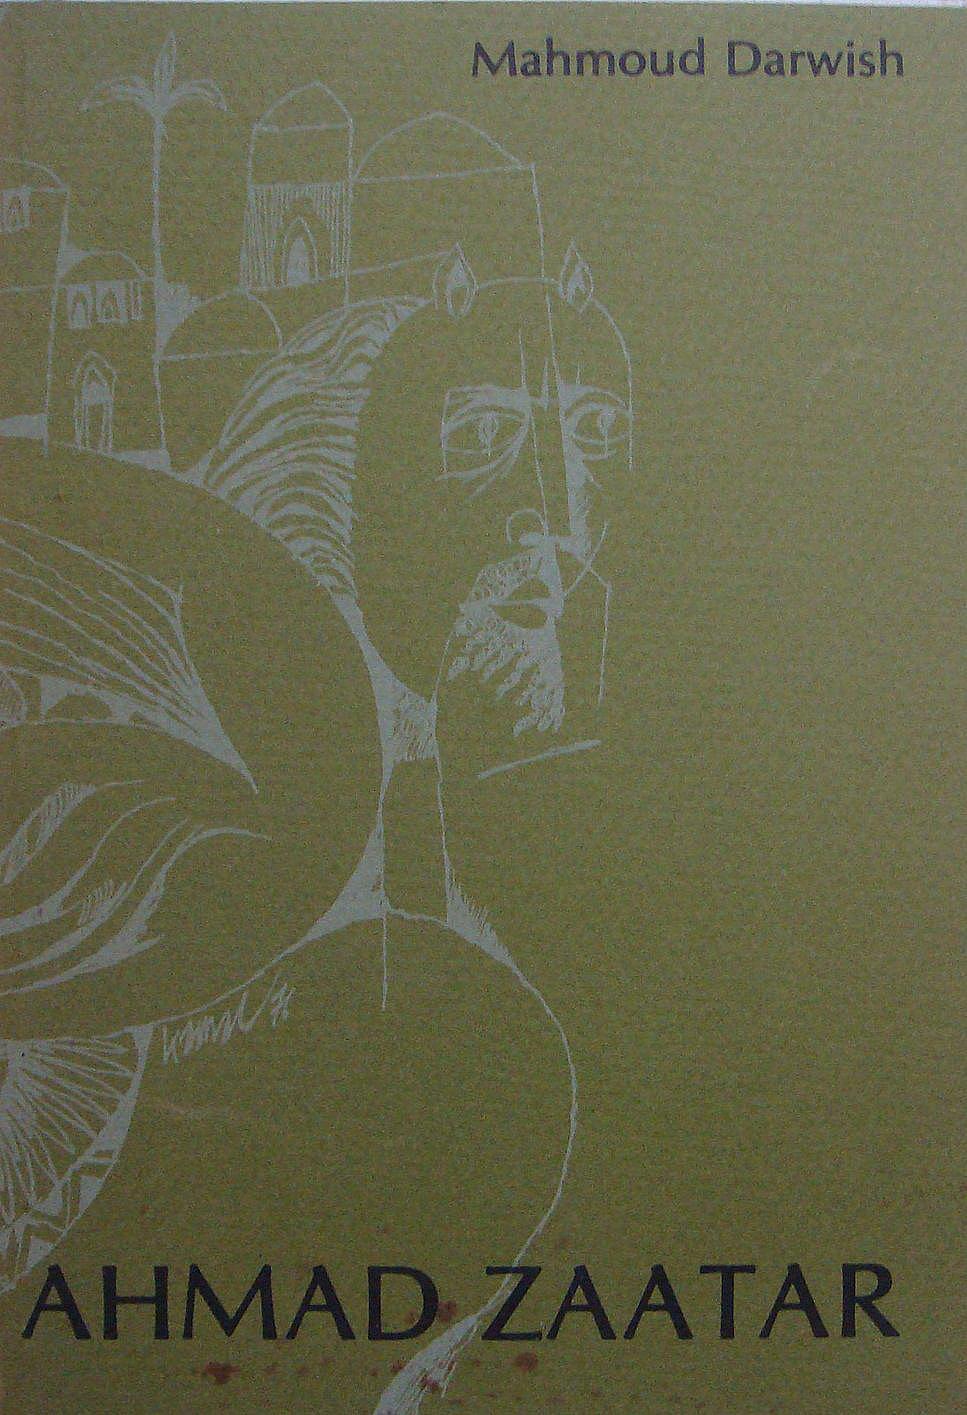 Ahmad Zaatar: A Poem , Mahmoud Darwish British Library,  YP.2015.a.6638 , 1970  Translated by Rana Kabbani, Illustrated by Kamal Boullata, Calligraphed by Elias Nicola